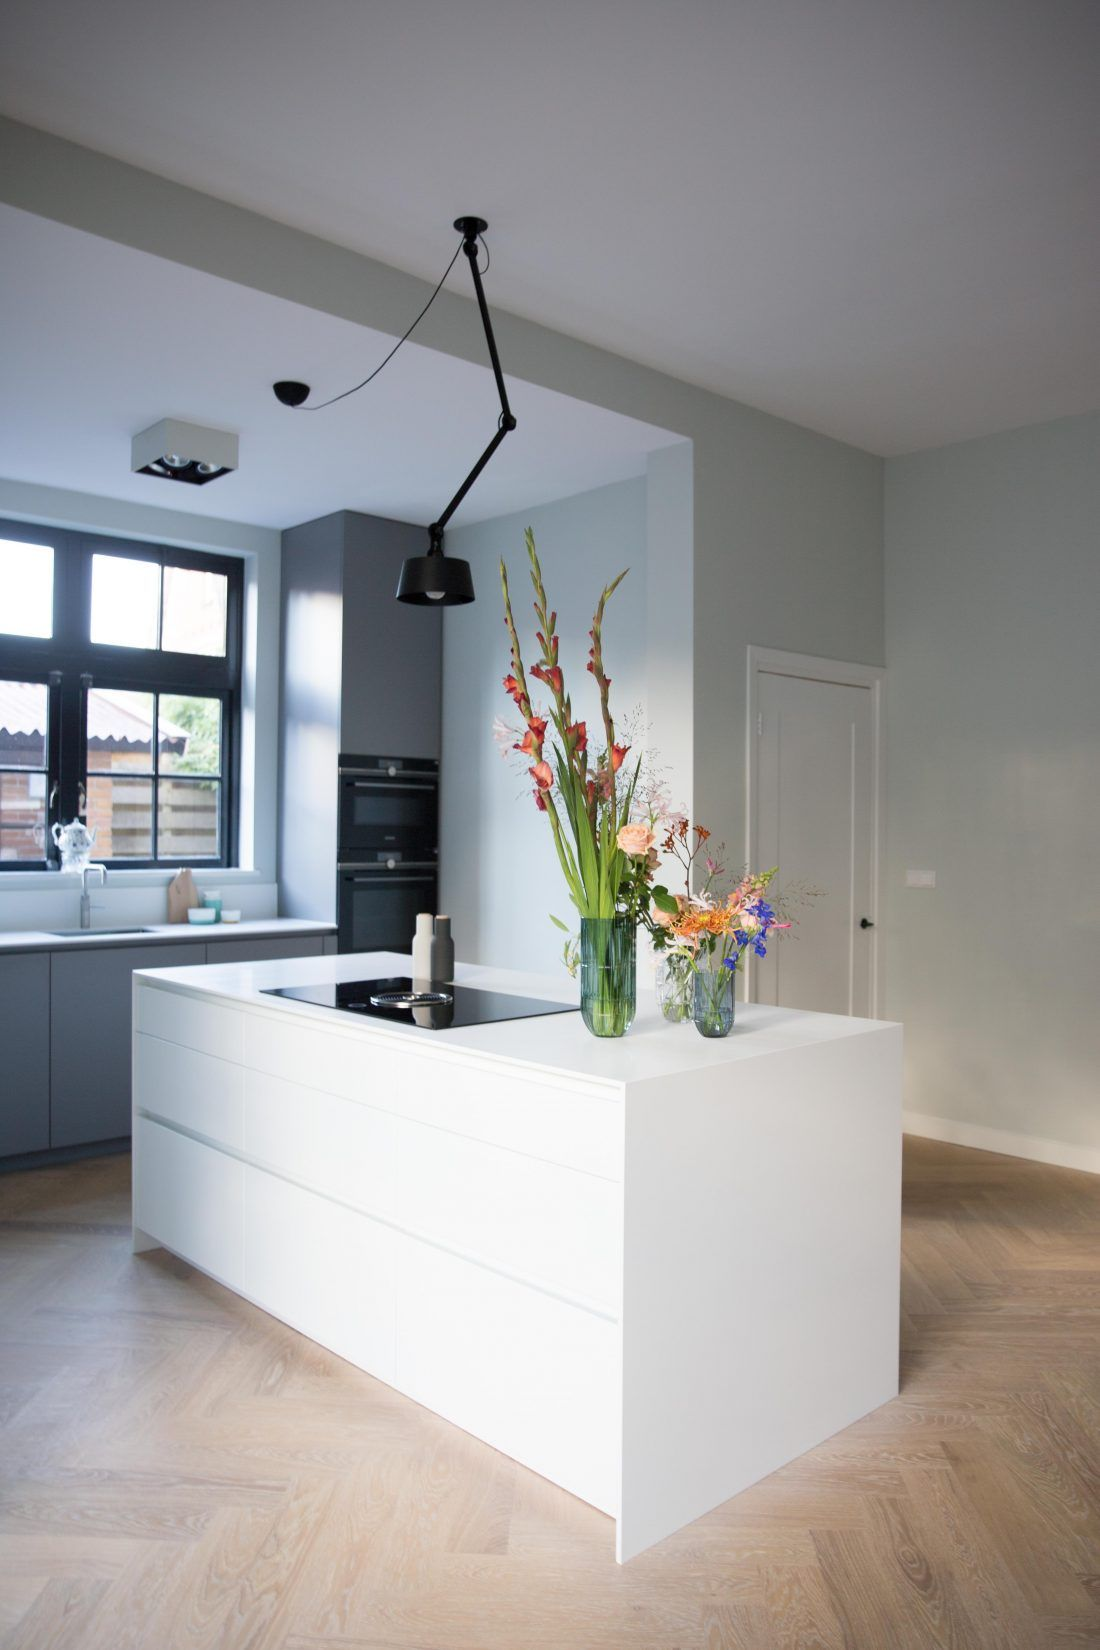 Femkeido Interior Design | Monumentaal Pand Apeldoorn | keuken ...